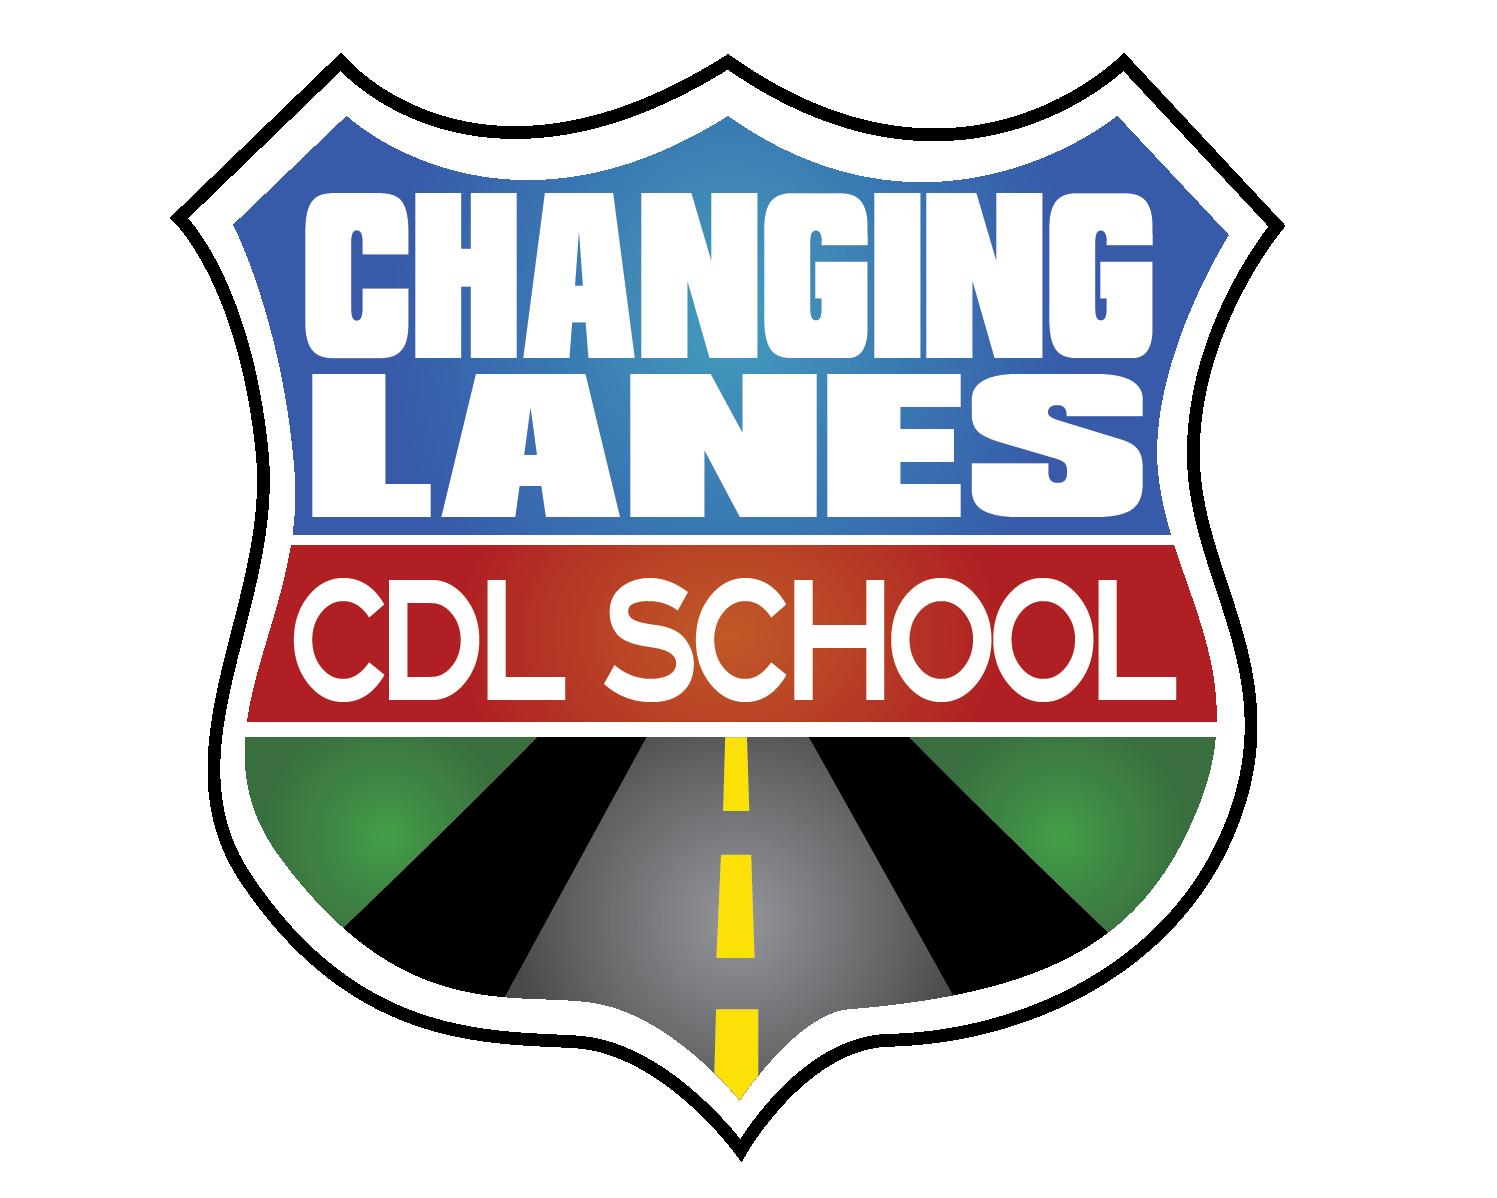 Changing Lanes CDL School